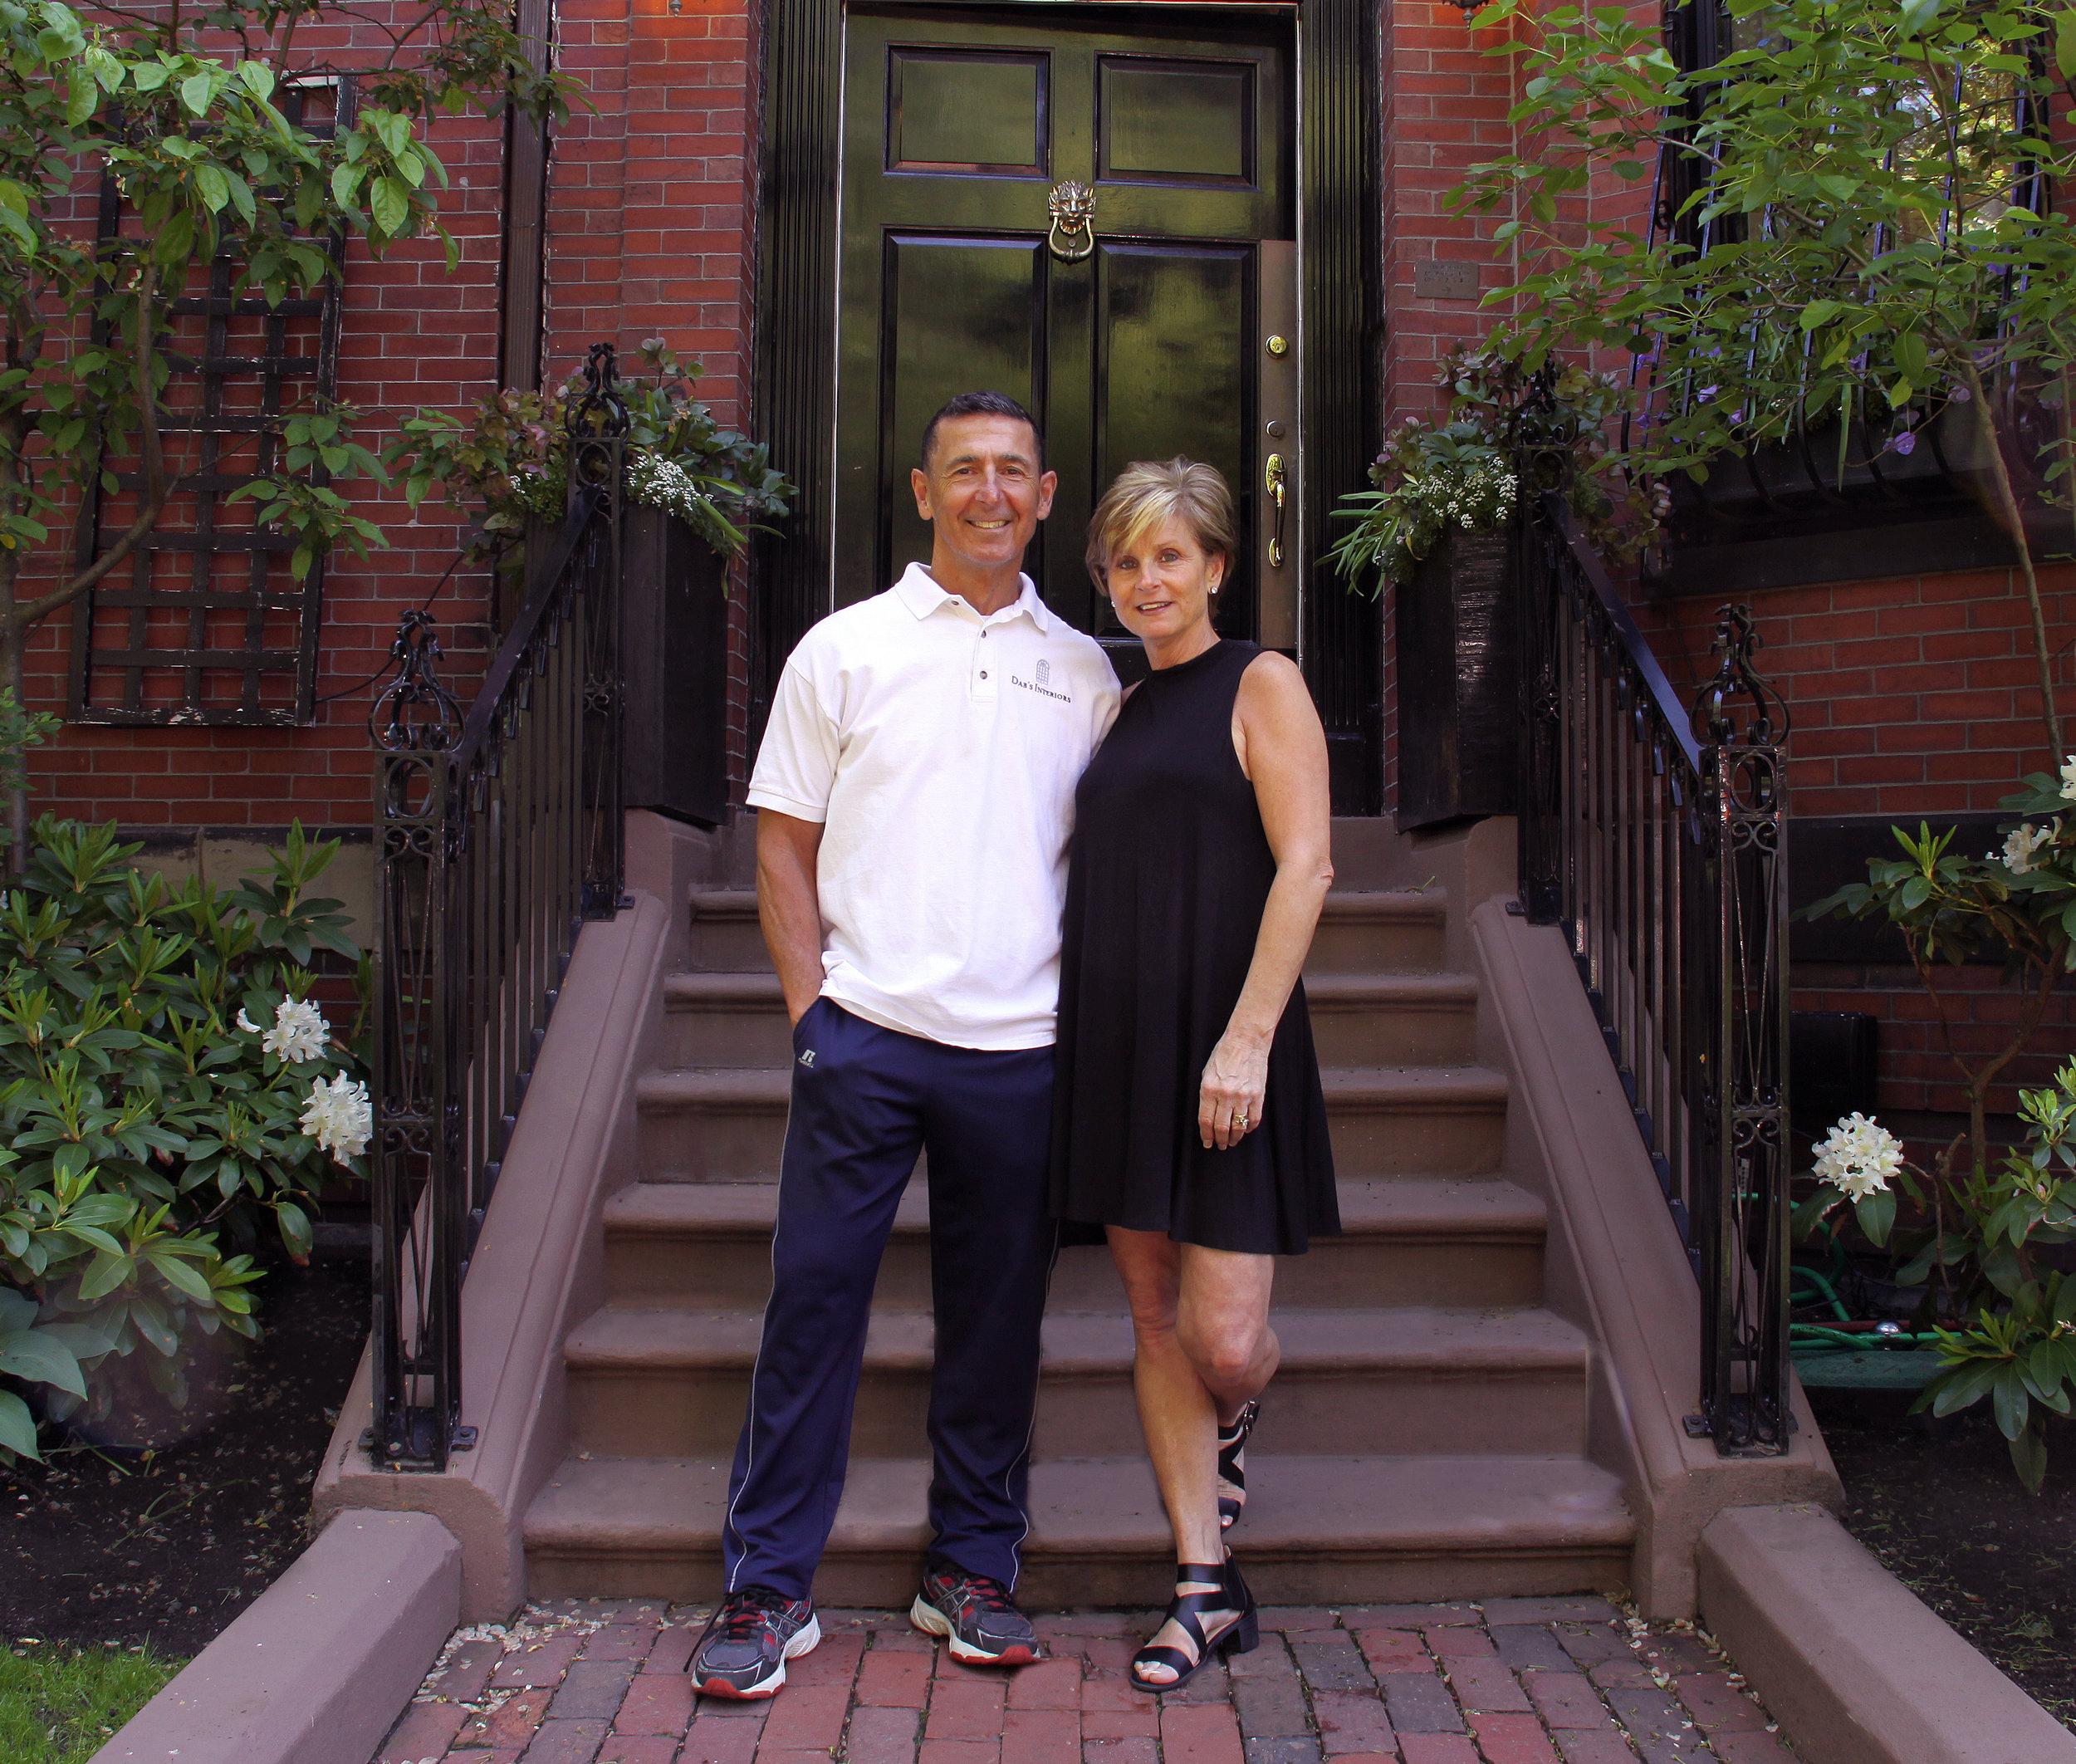 Where it all began - We are Jennifer and Joe Dabenigno